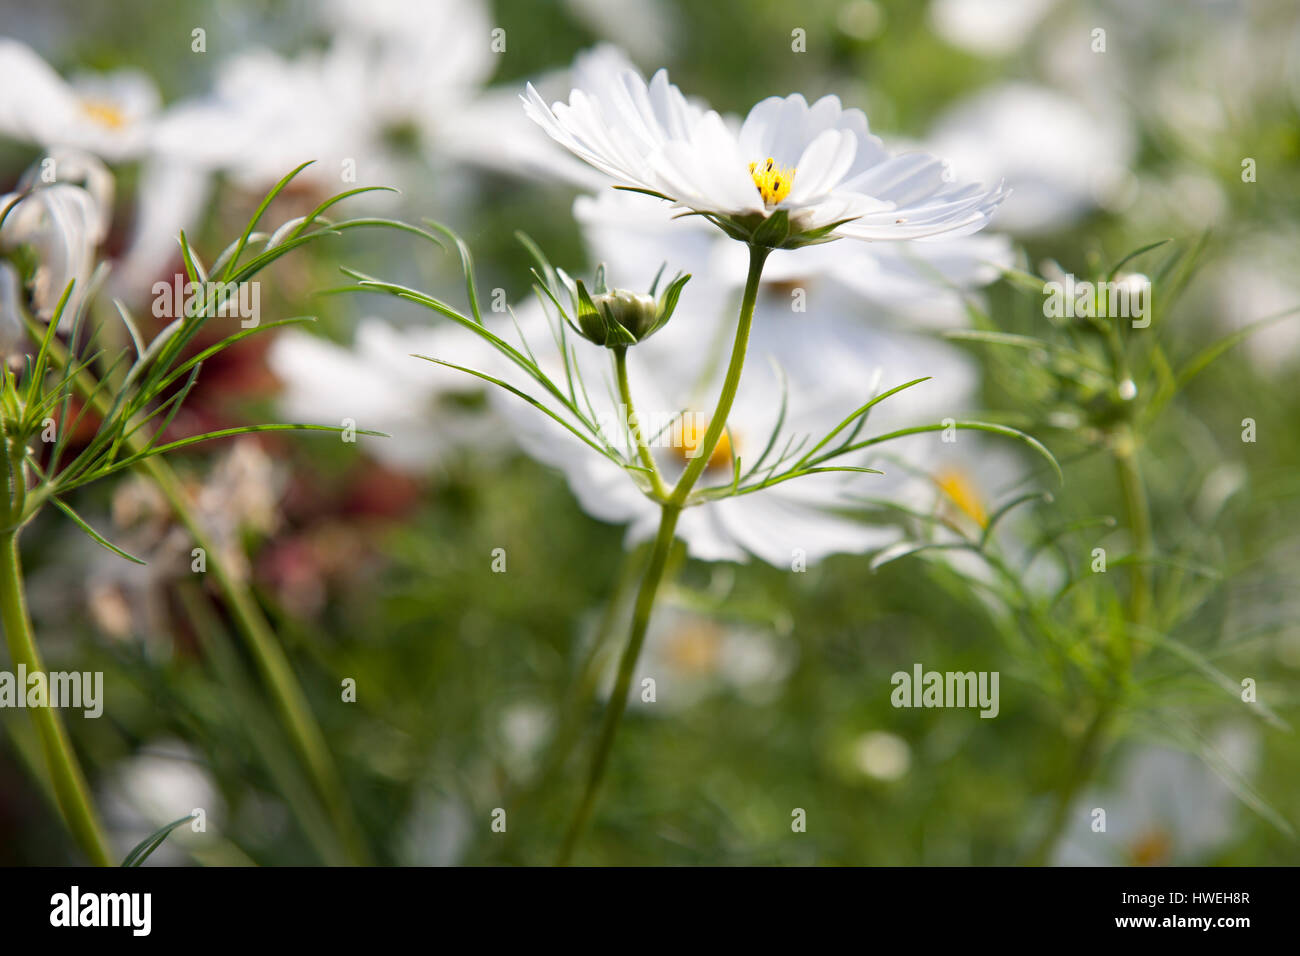 White cosmos flowers growing in a garden stock photo 136159879 alamy white cosmos flowers growing in a garden mightylinksfo